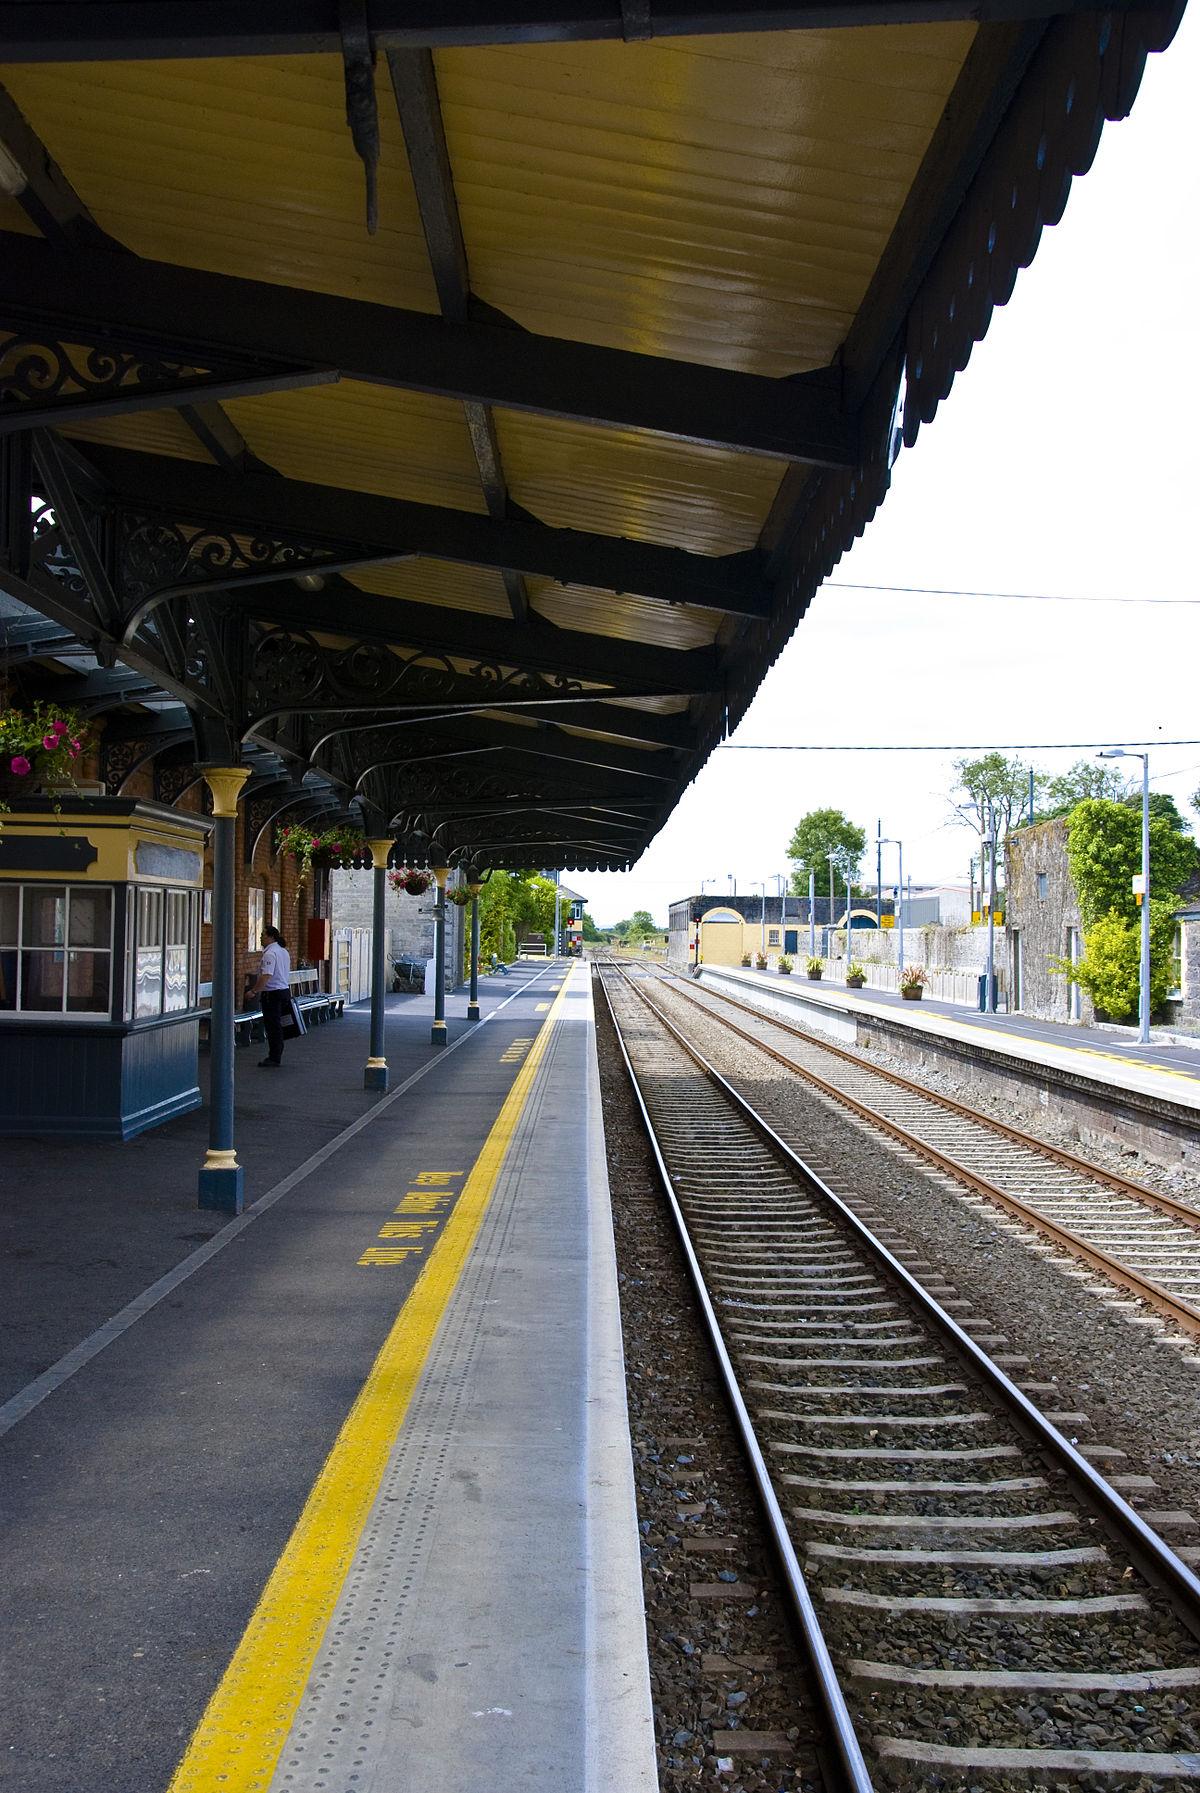 Athenry railway station - Wikipedia